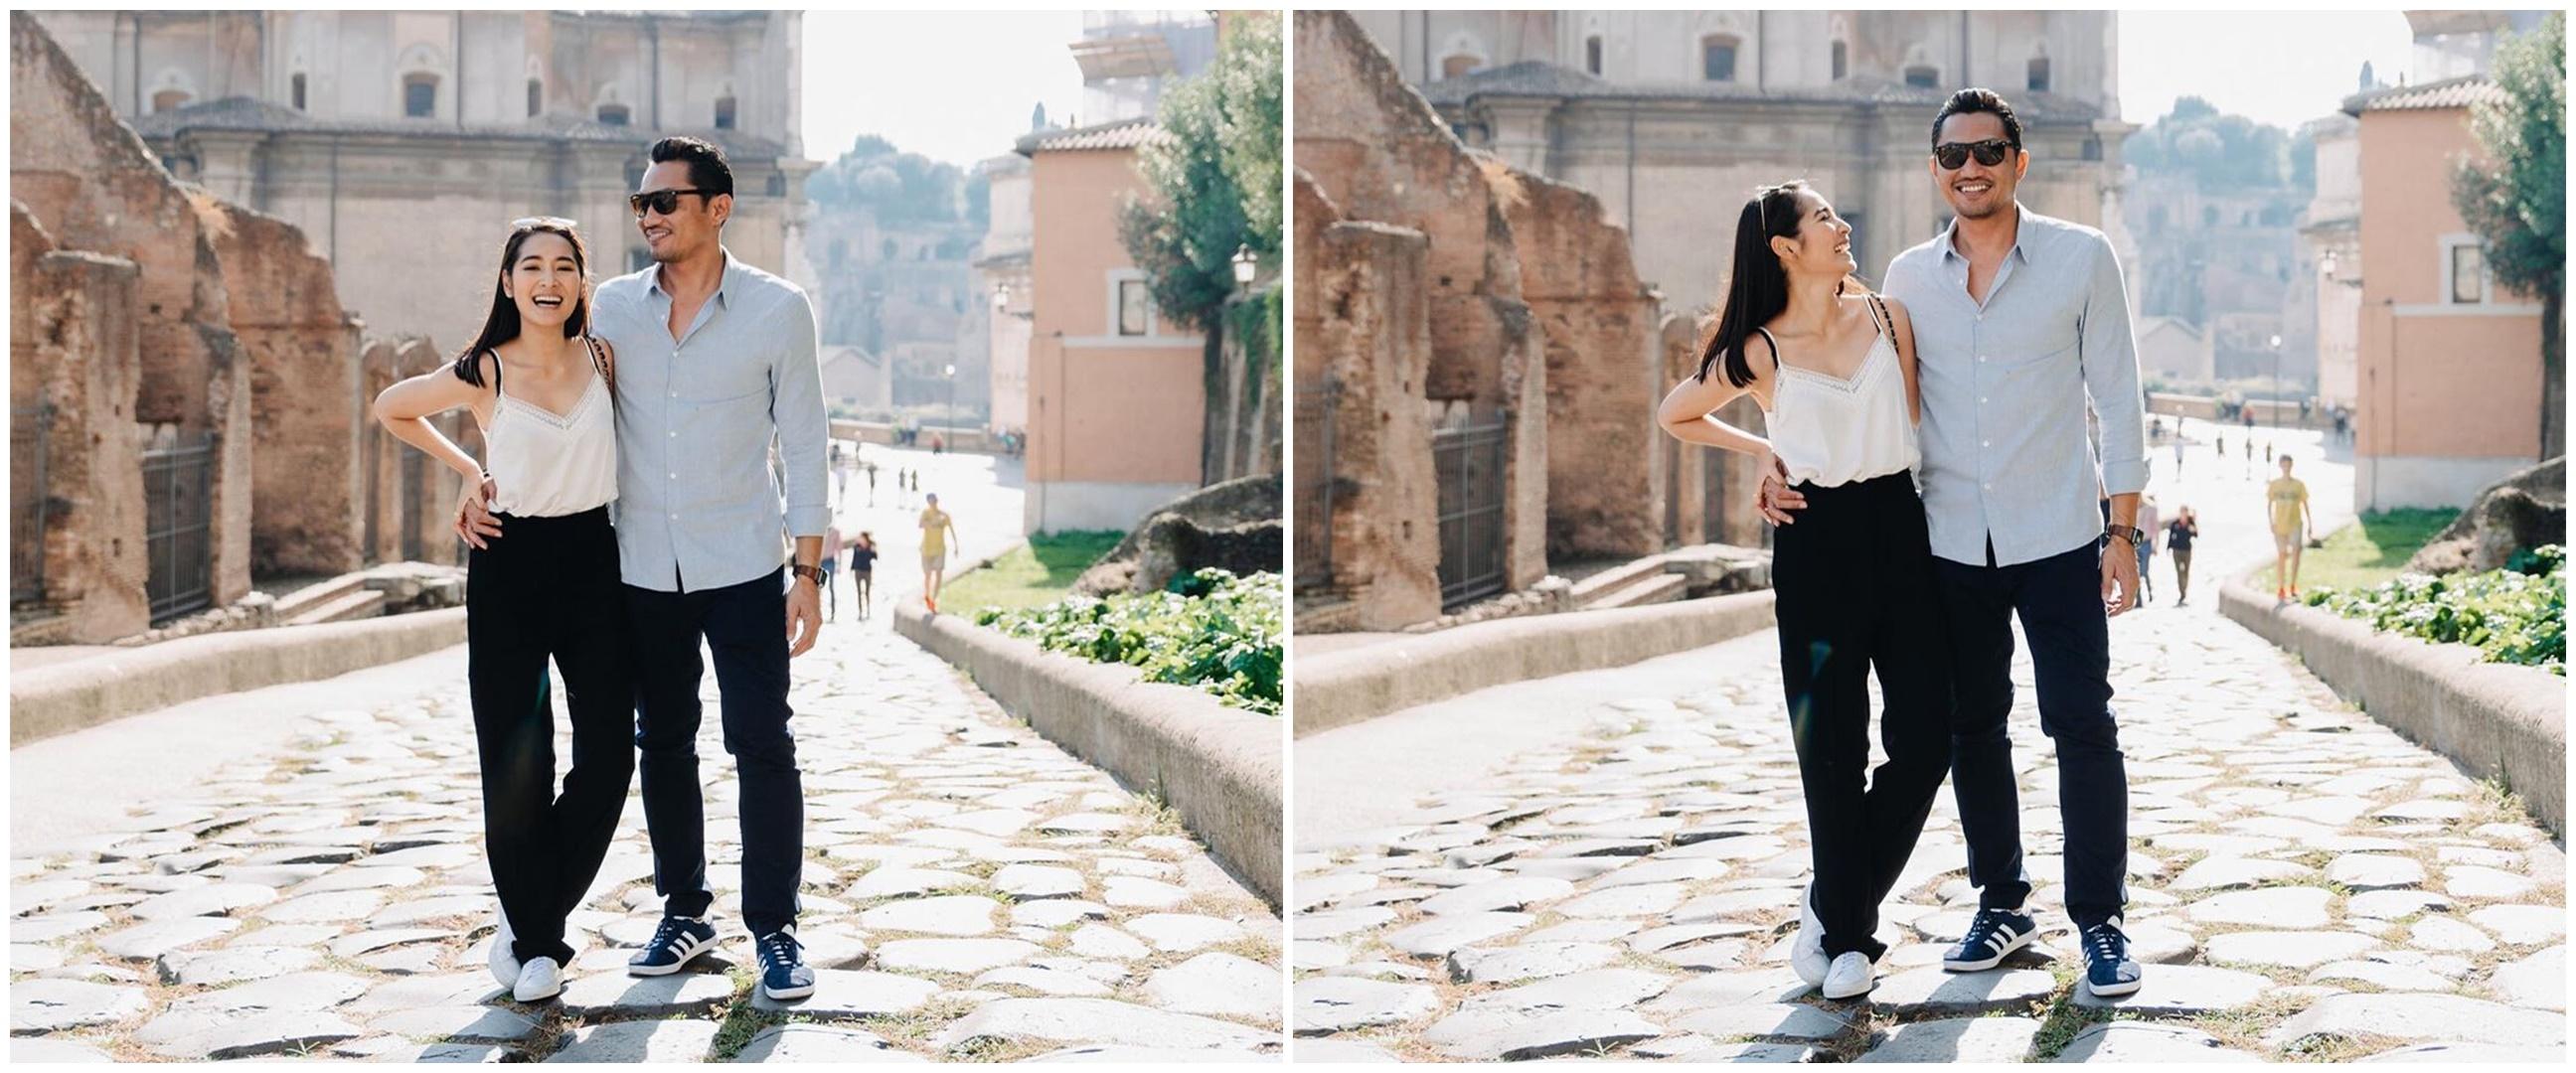 10 Momen pernikahan Niken Anjani & Adimaz Motik, digelar tertutup